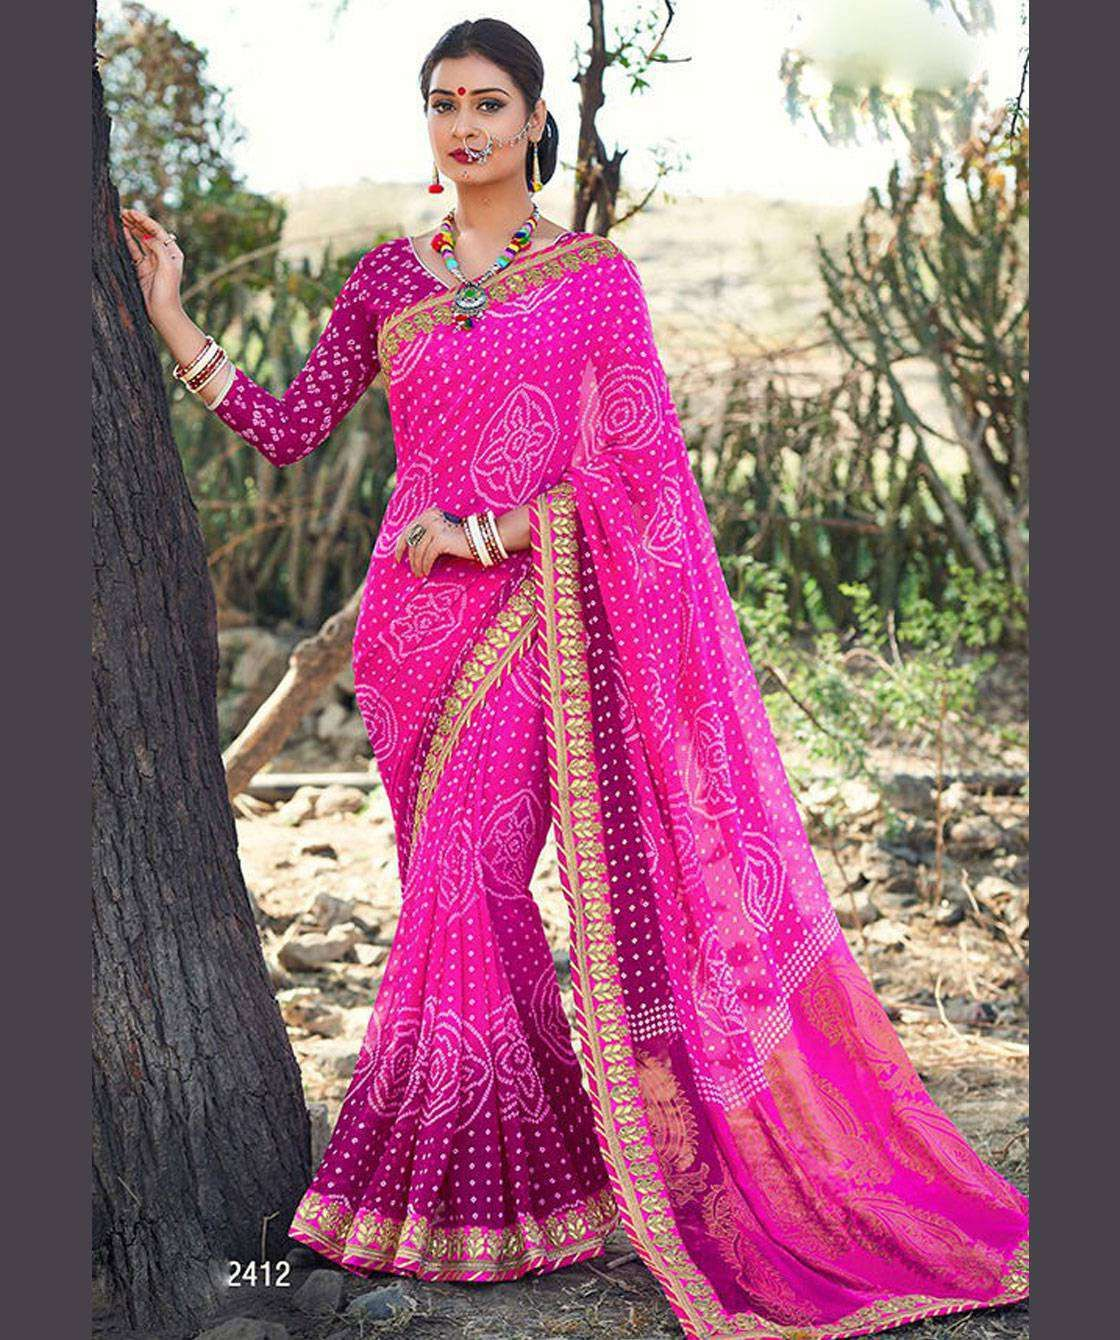 70581f97da Indian Baby Showers, Saree Wedding, Designer Sarees Wedding, Indian  Designer Sarees, Wedding